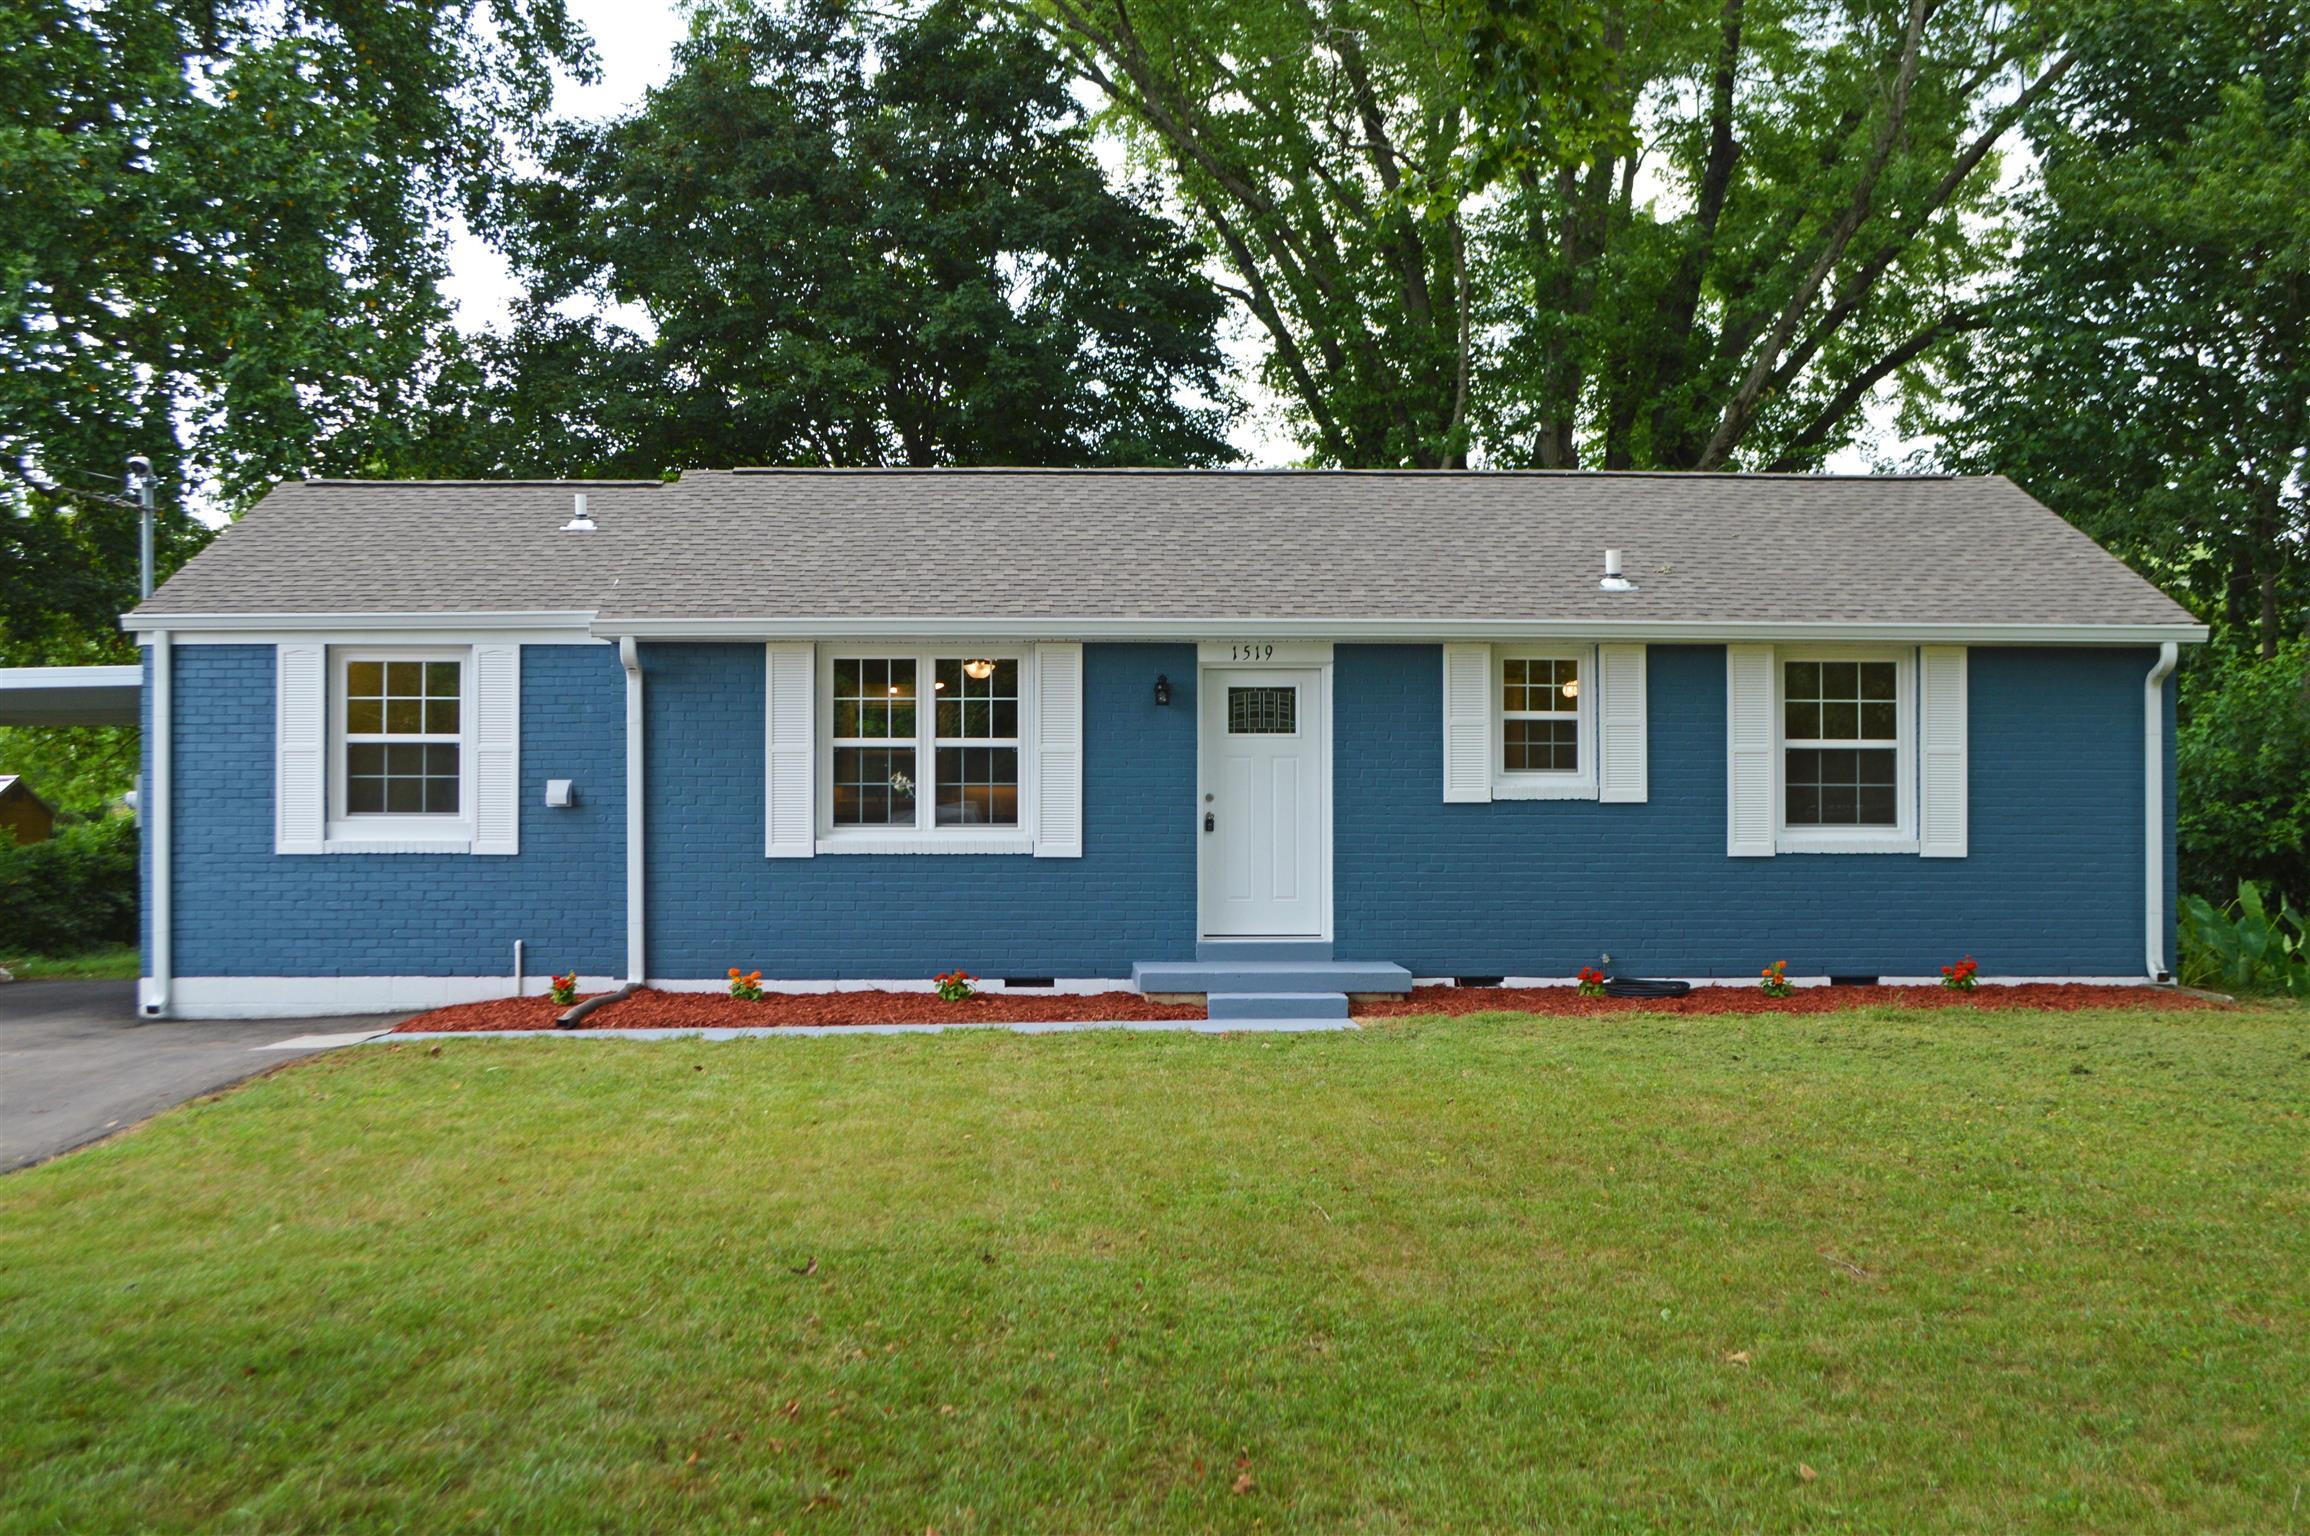 1519 Atlas St, Murfreesboro, TN 37130 - Murfreesboro, TN real estate listing